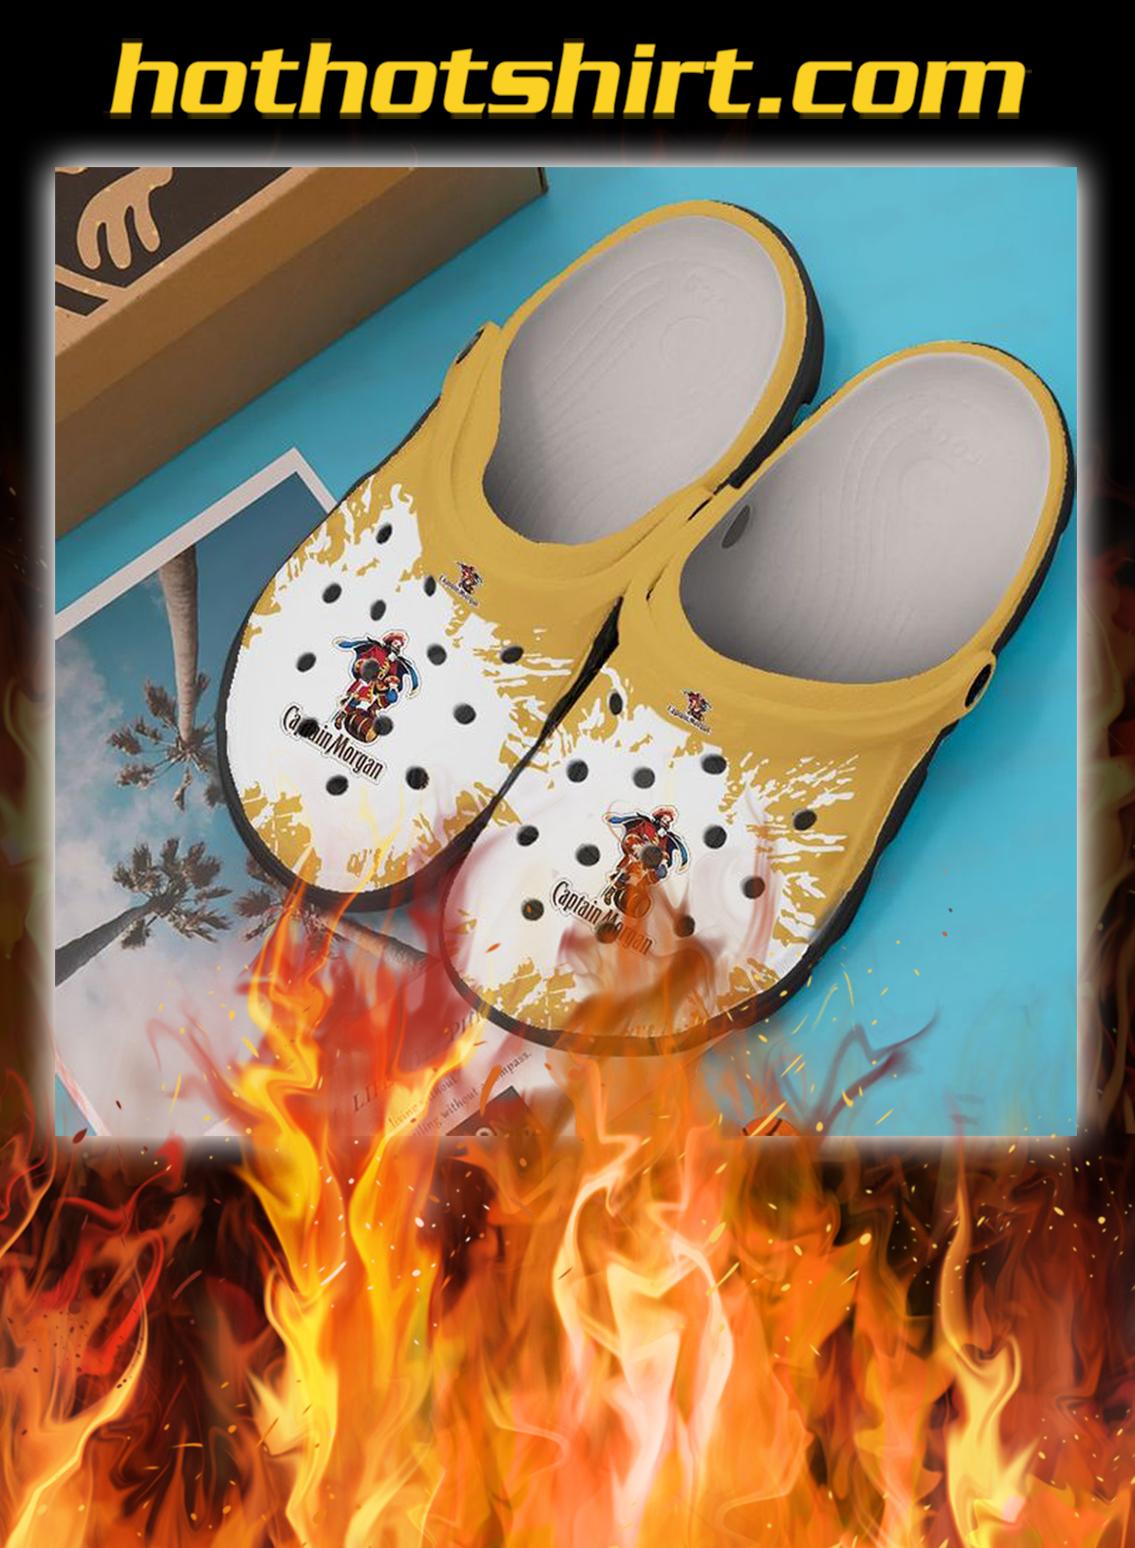 Captain morgan crocband crocs shoes- pic 1